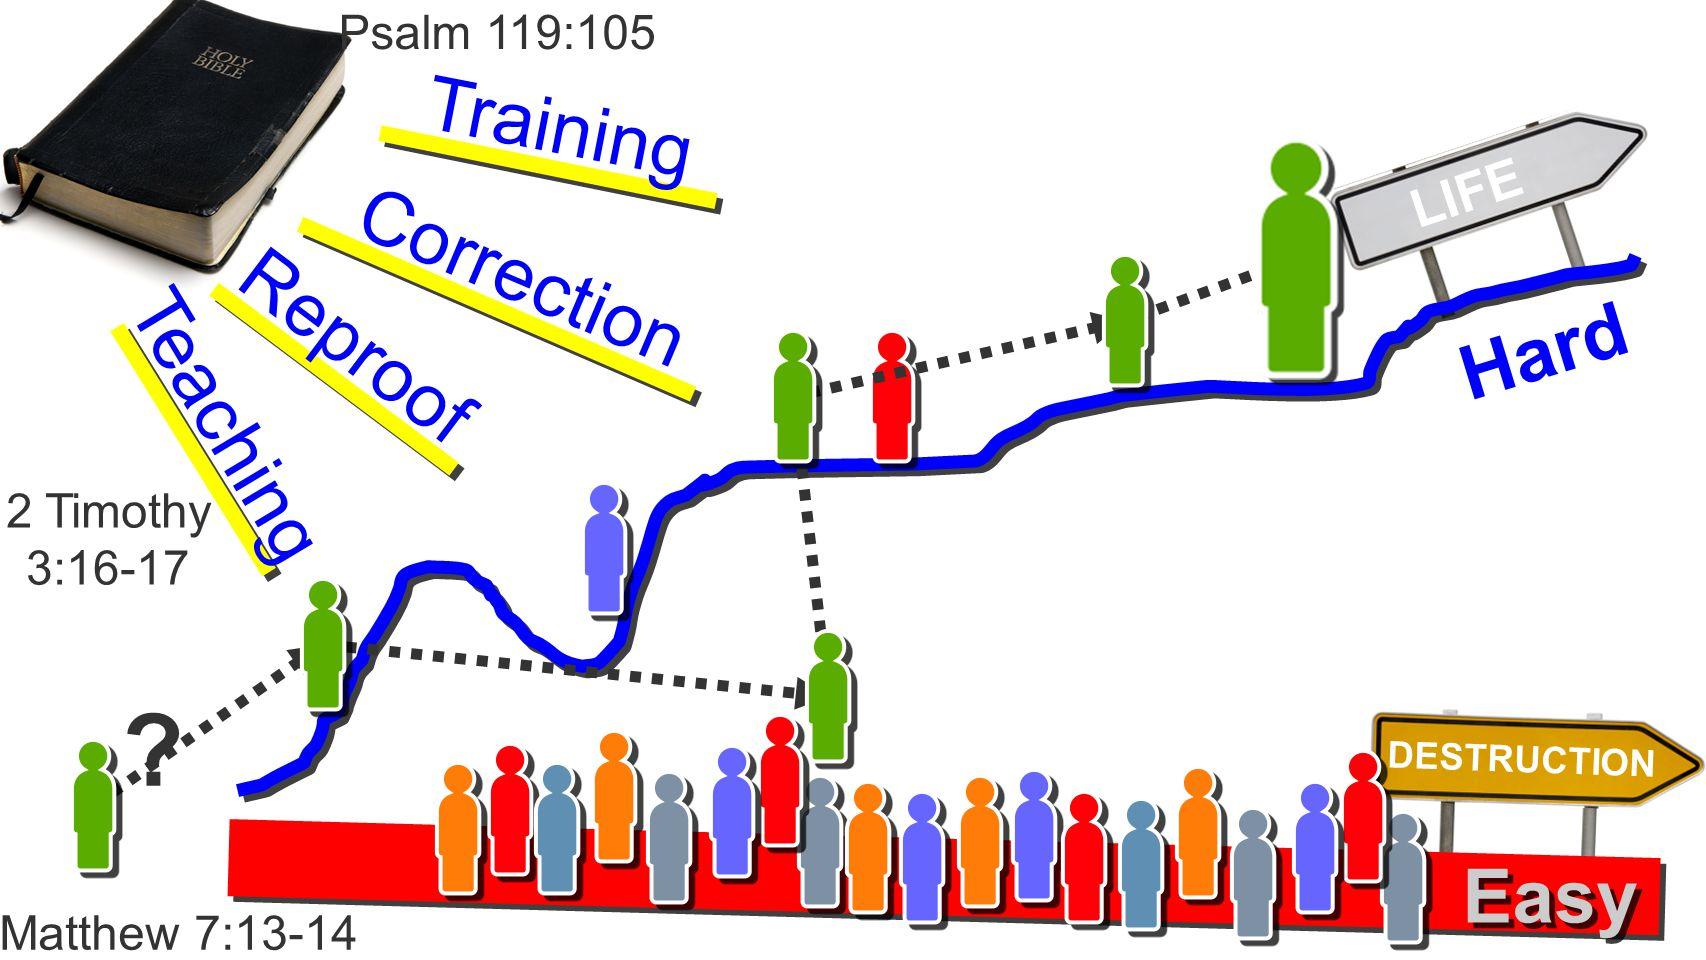 LIFE Hard Easy Teaching Reproof Correction Training .